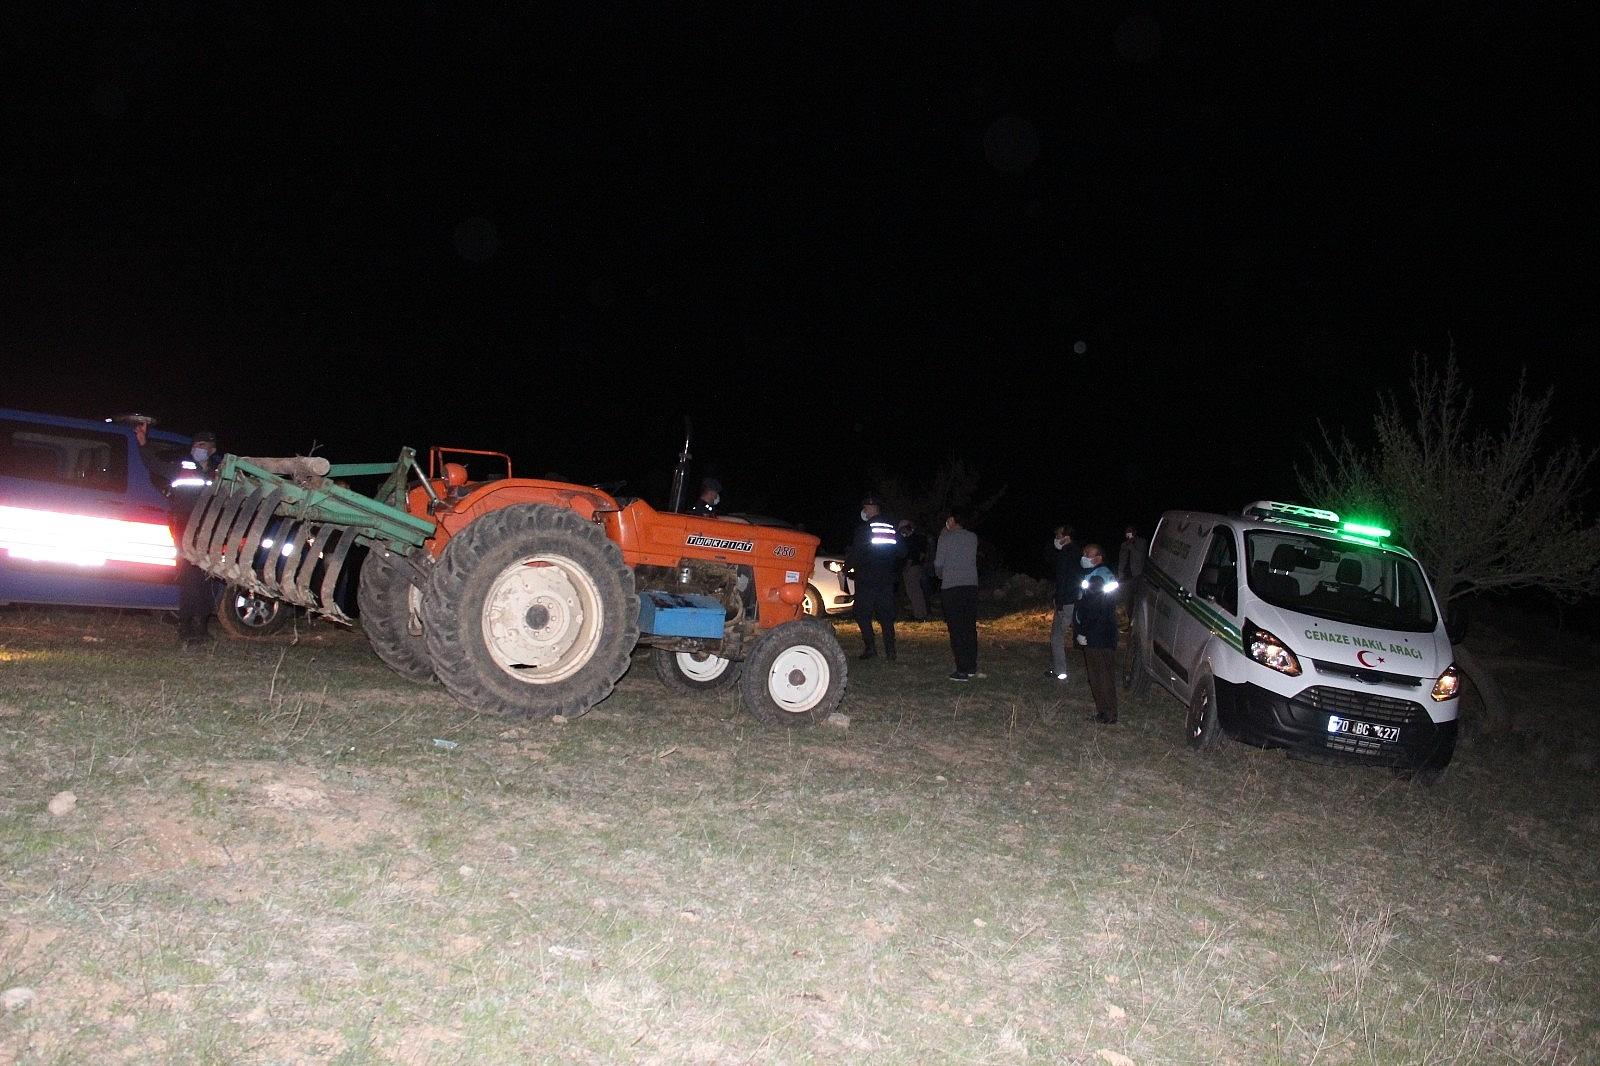 2021/04/karamanda-traktorun-altinda-kalan-ciftci-hayatini-kaybetti-20210421AW30-4.jpg